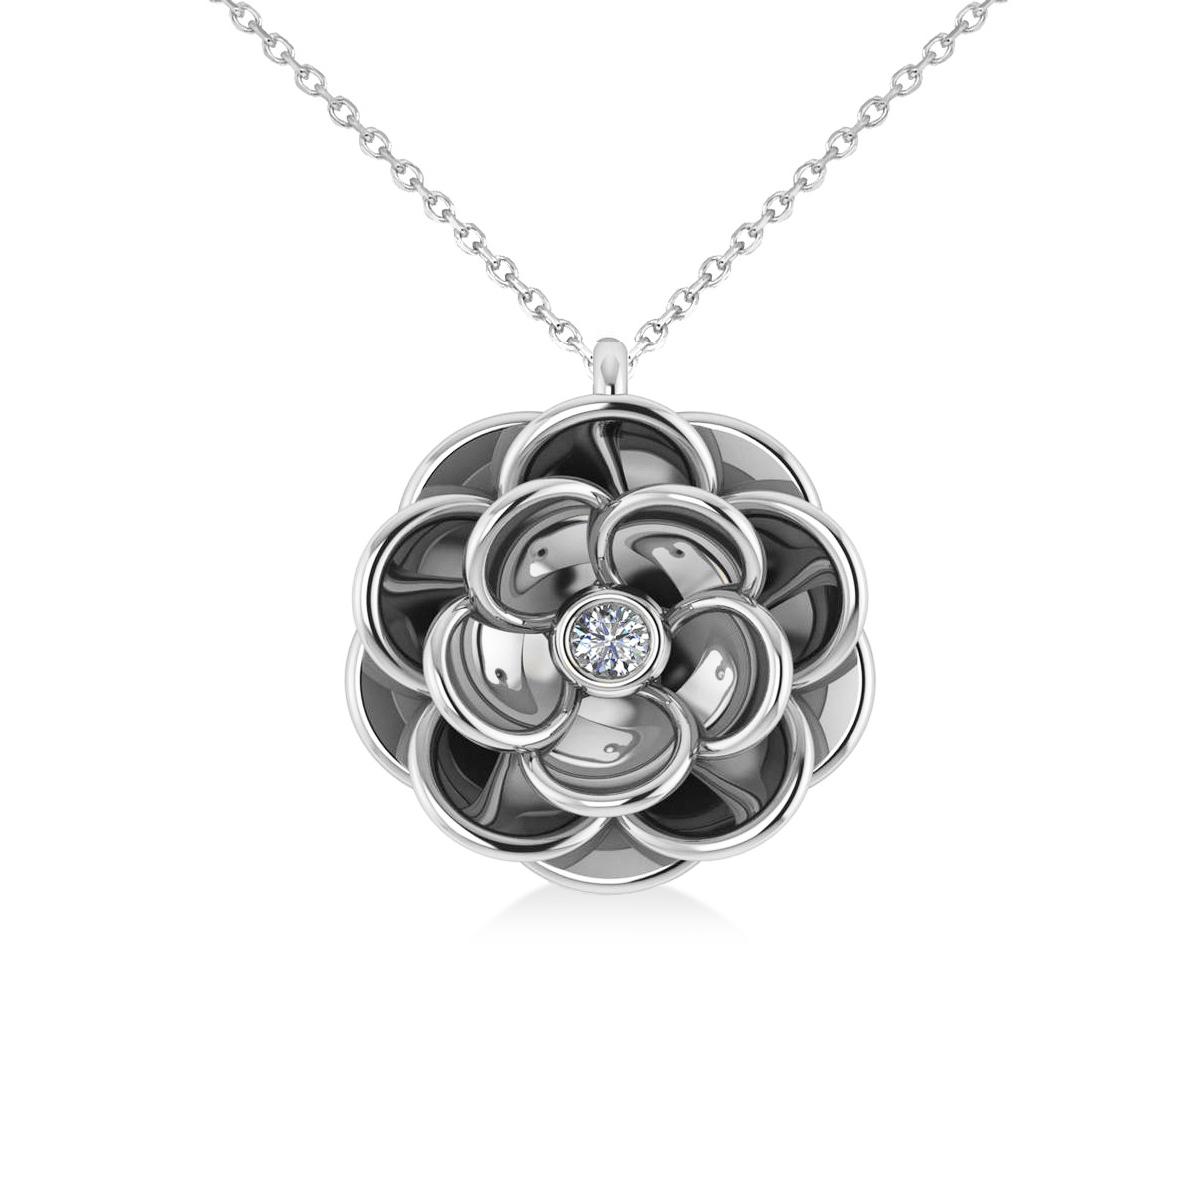 Diamond Round Flower Pendant Necklace 14k White Gold (0.05ct)